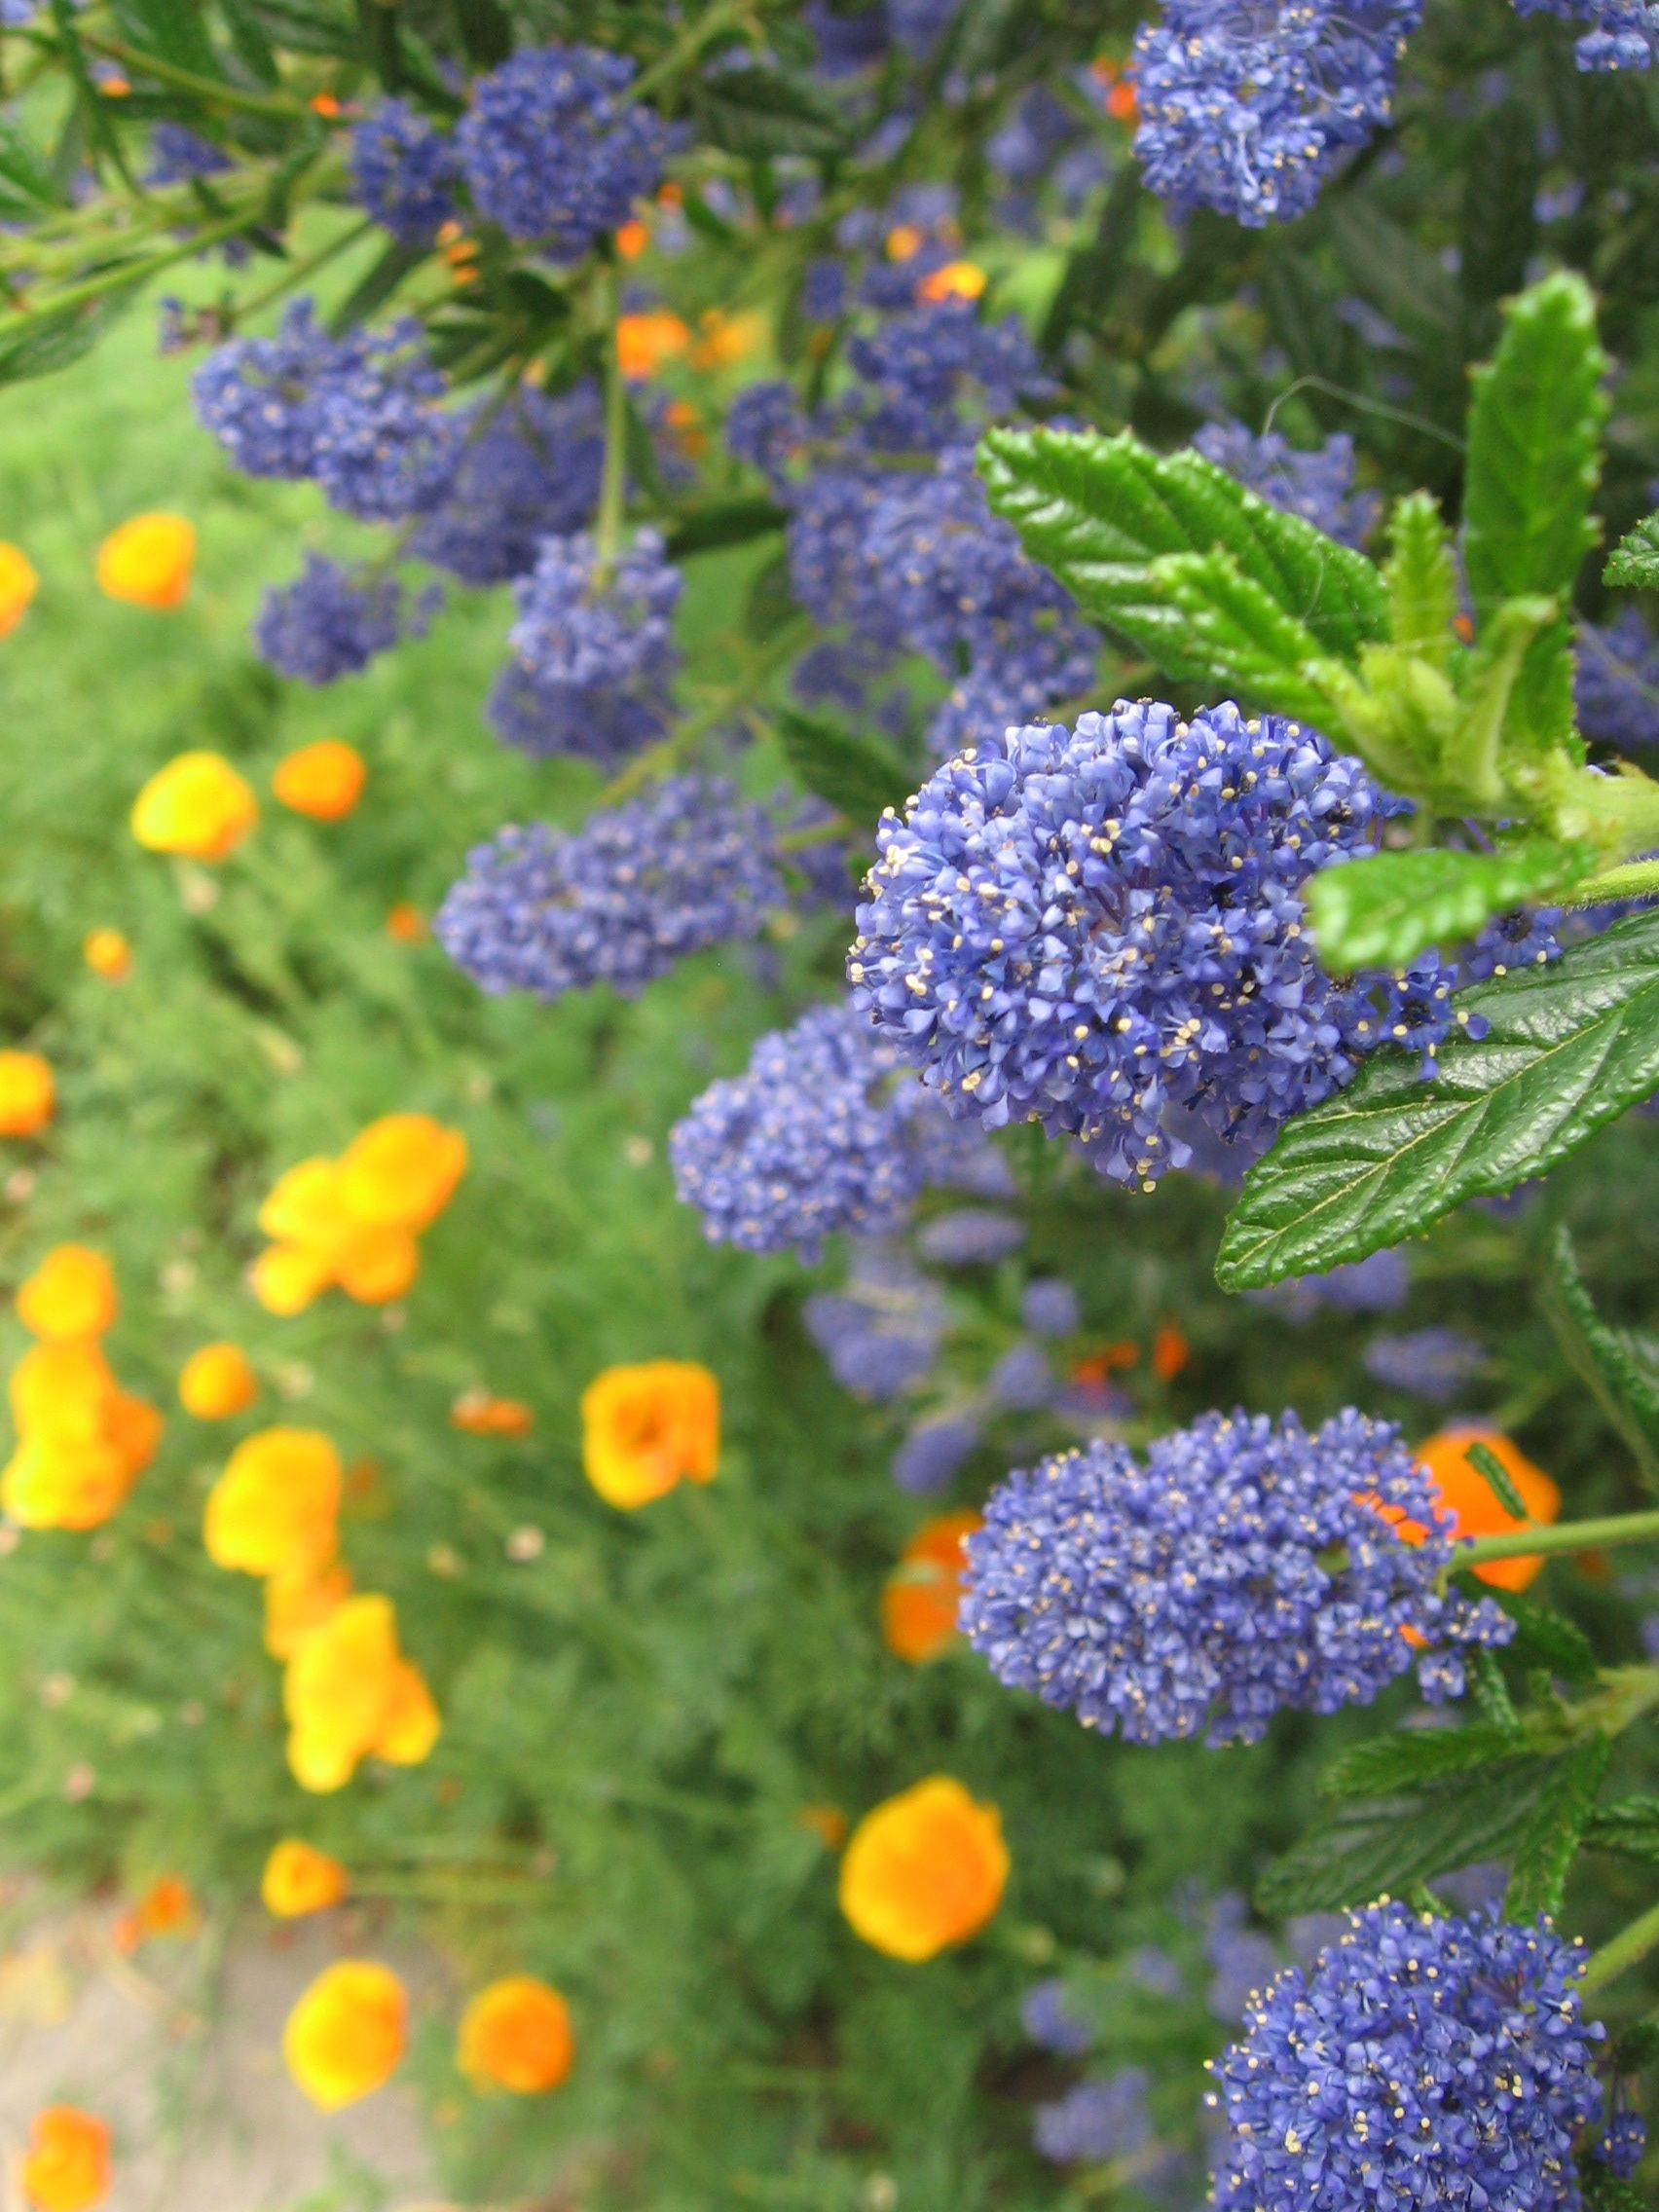 Ceanothus Or California Lilac Purpleblue Flowers Grows Best In